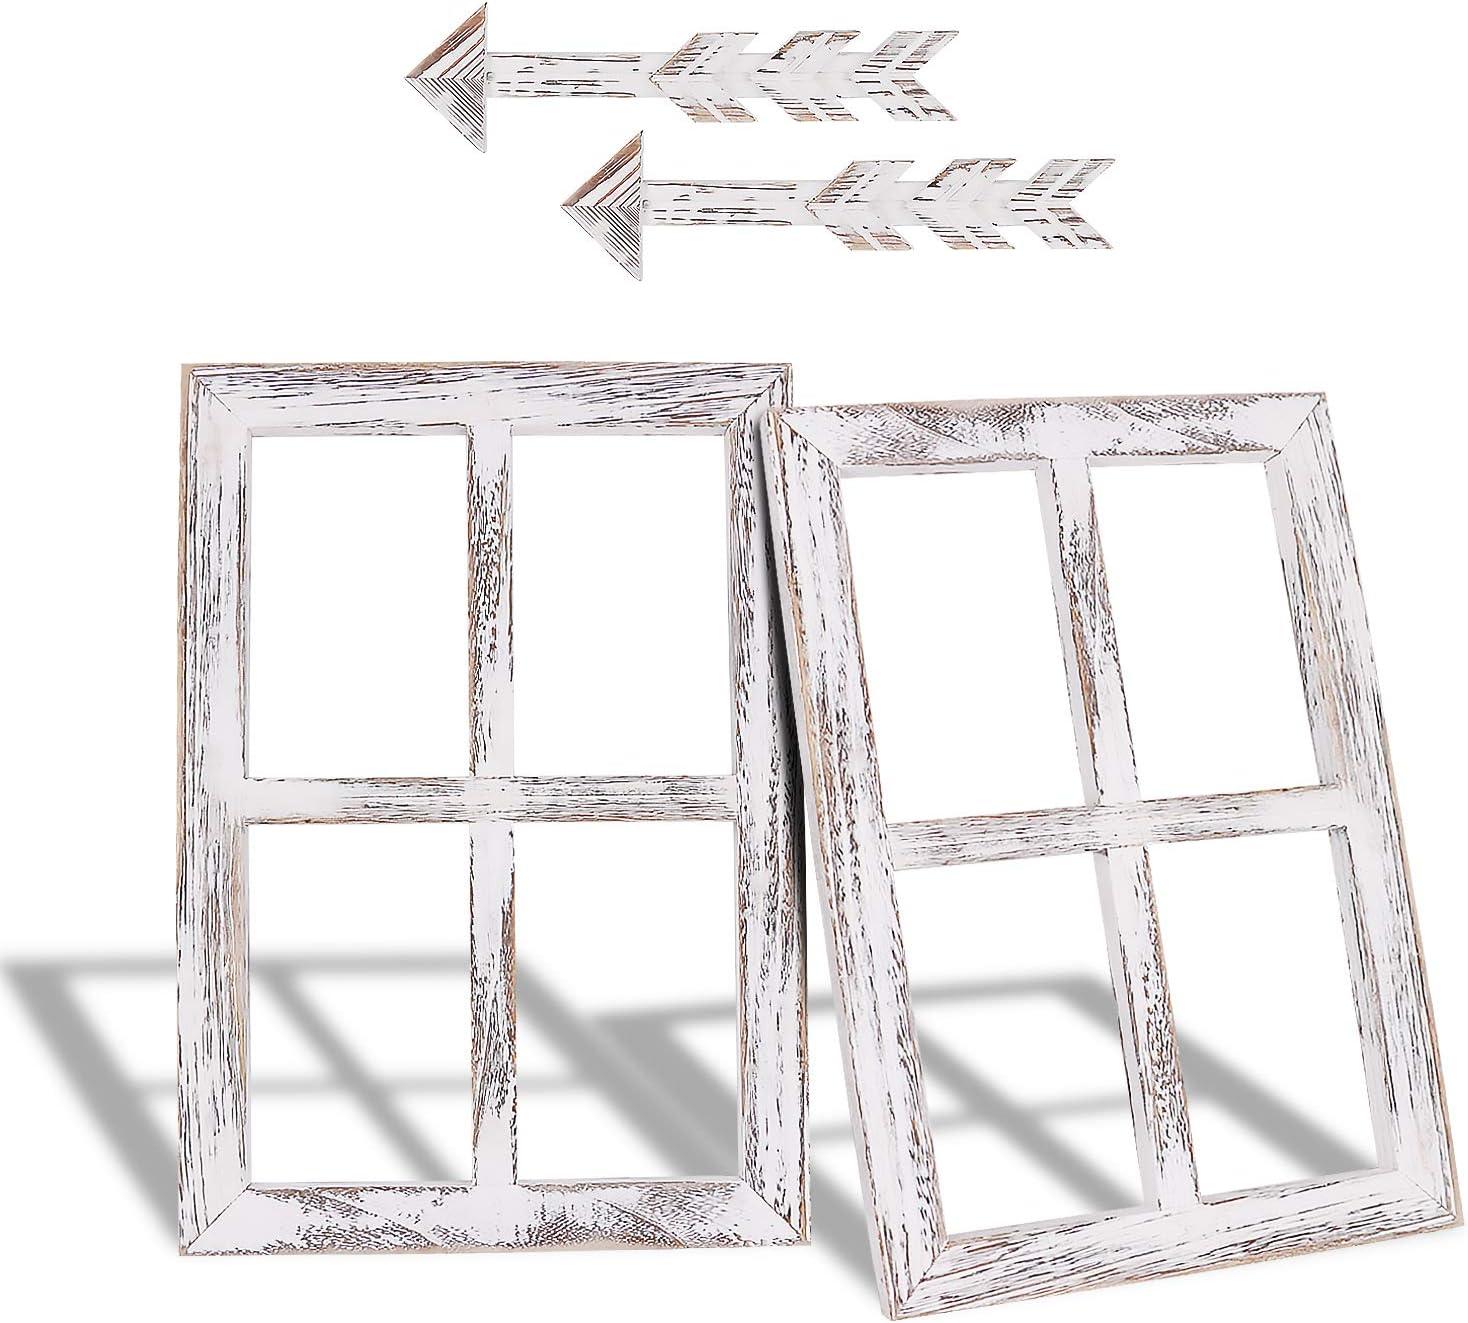 Honest Farmhouse Wall Décor Window Frame,Rustic Window Pane with Arrows Decor,Home Decor Window Barnwood Frames,Window Rustic Wall Art for Entryways, Living Room, Dining Room, Bedroom, 2 Set(Small)